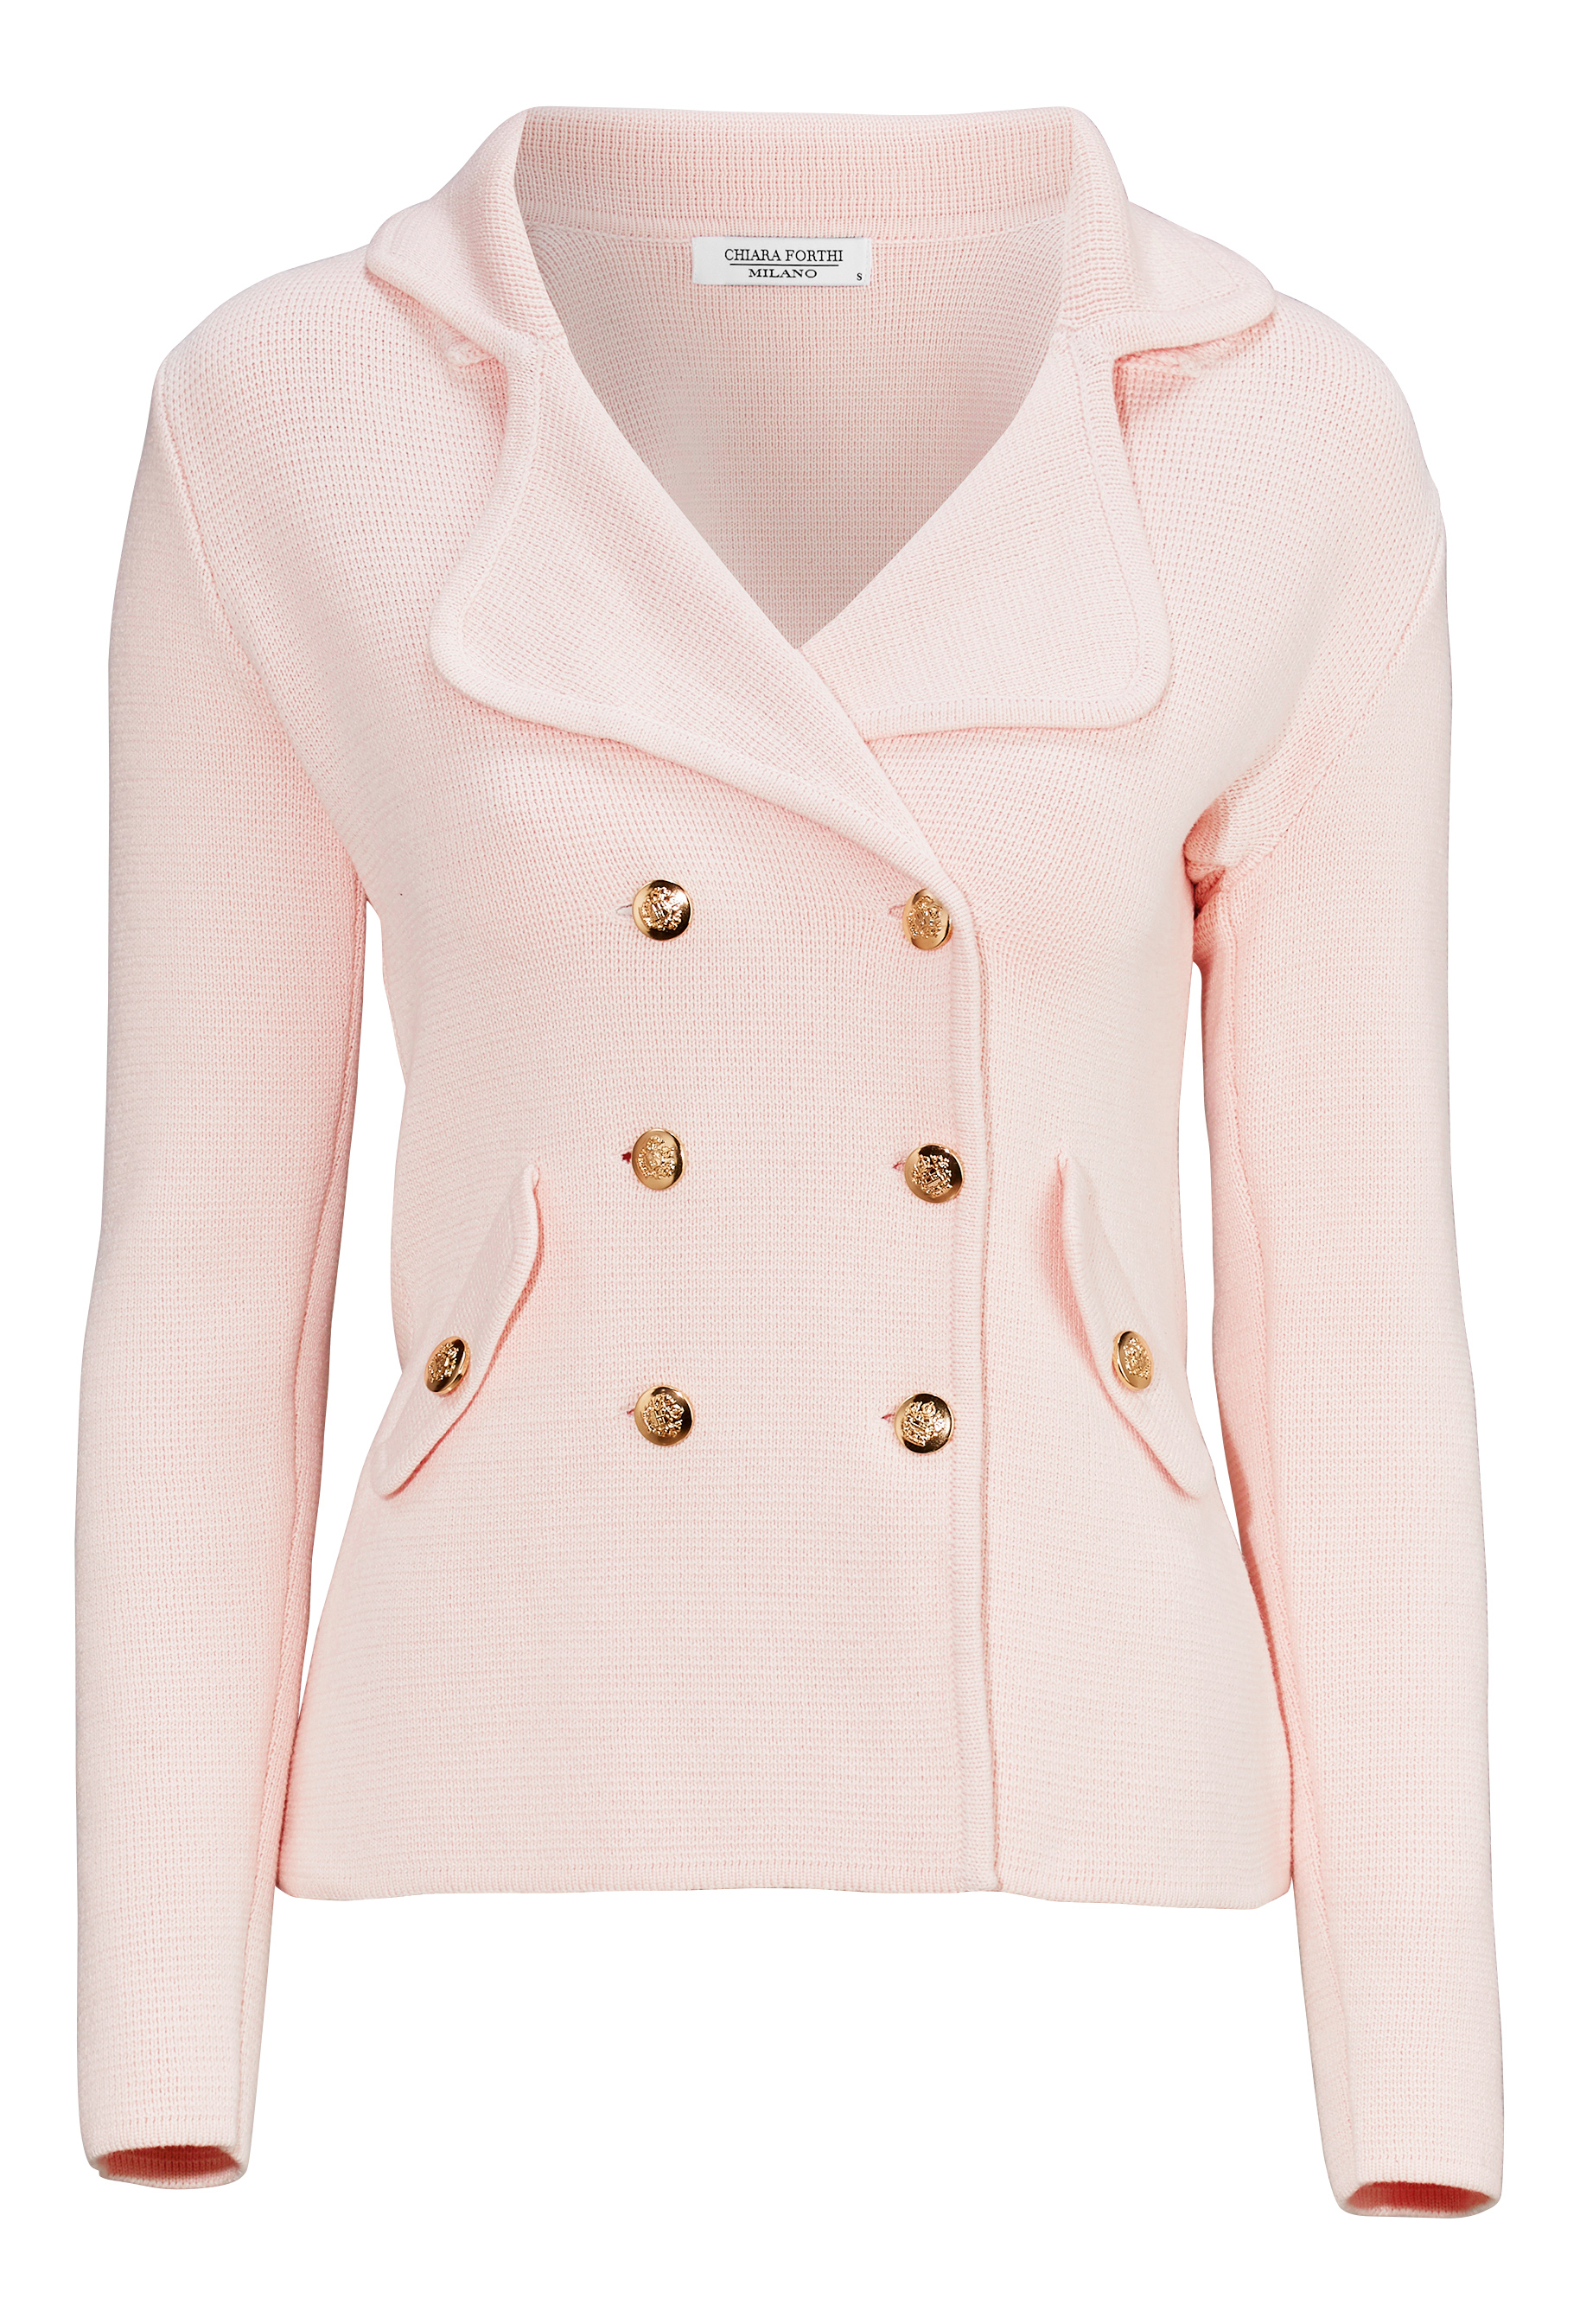 aefdcee2 Chiara Forthi Chiara Heavy Knit Blazer Light pink - Bubbleroom